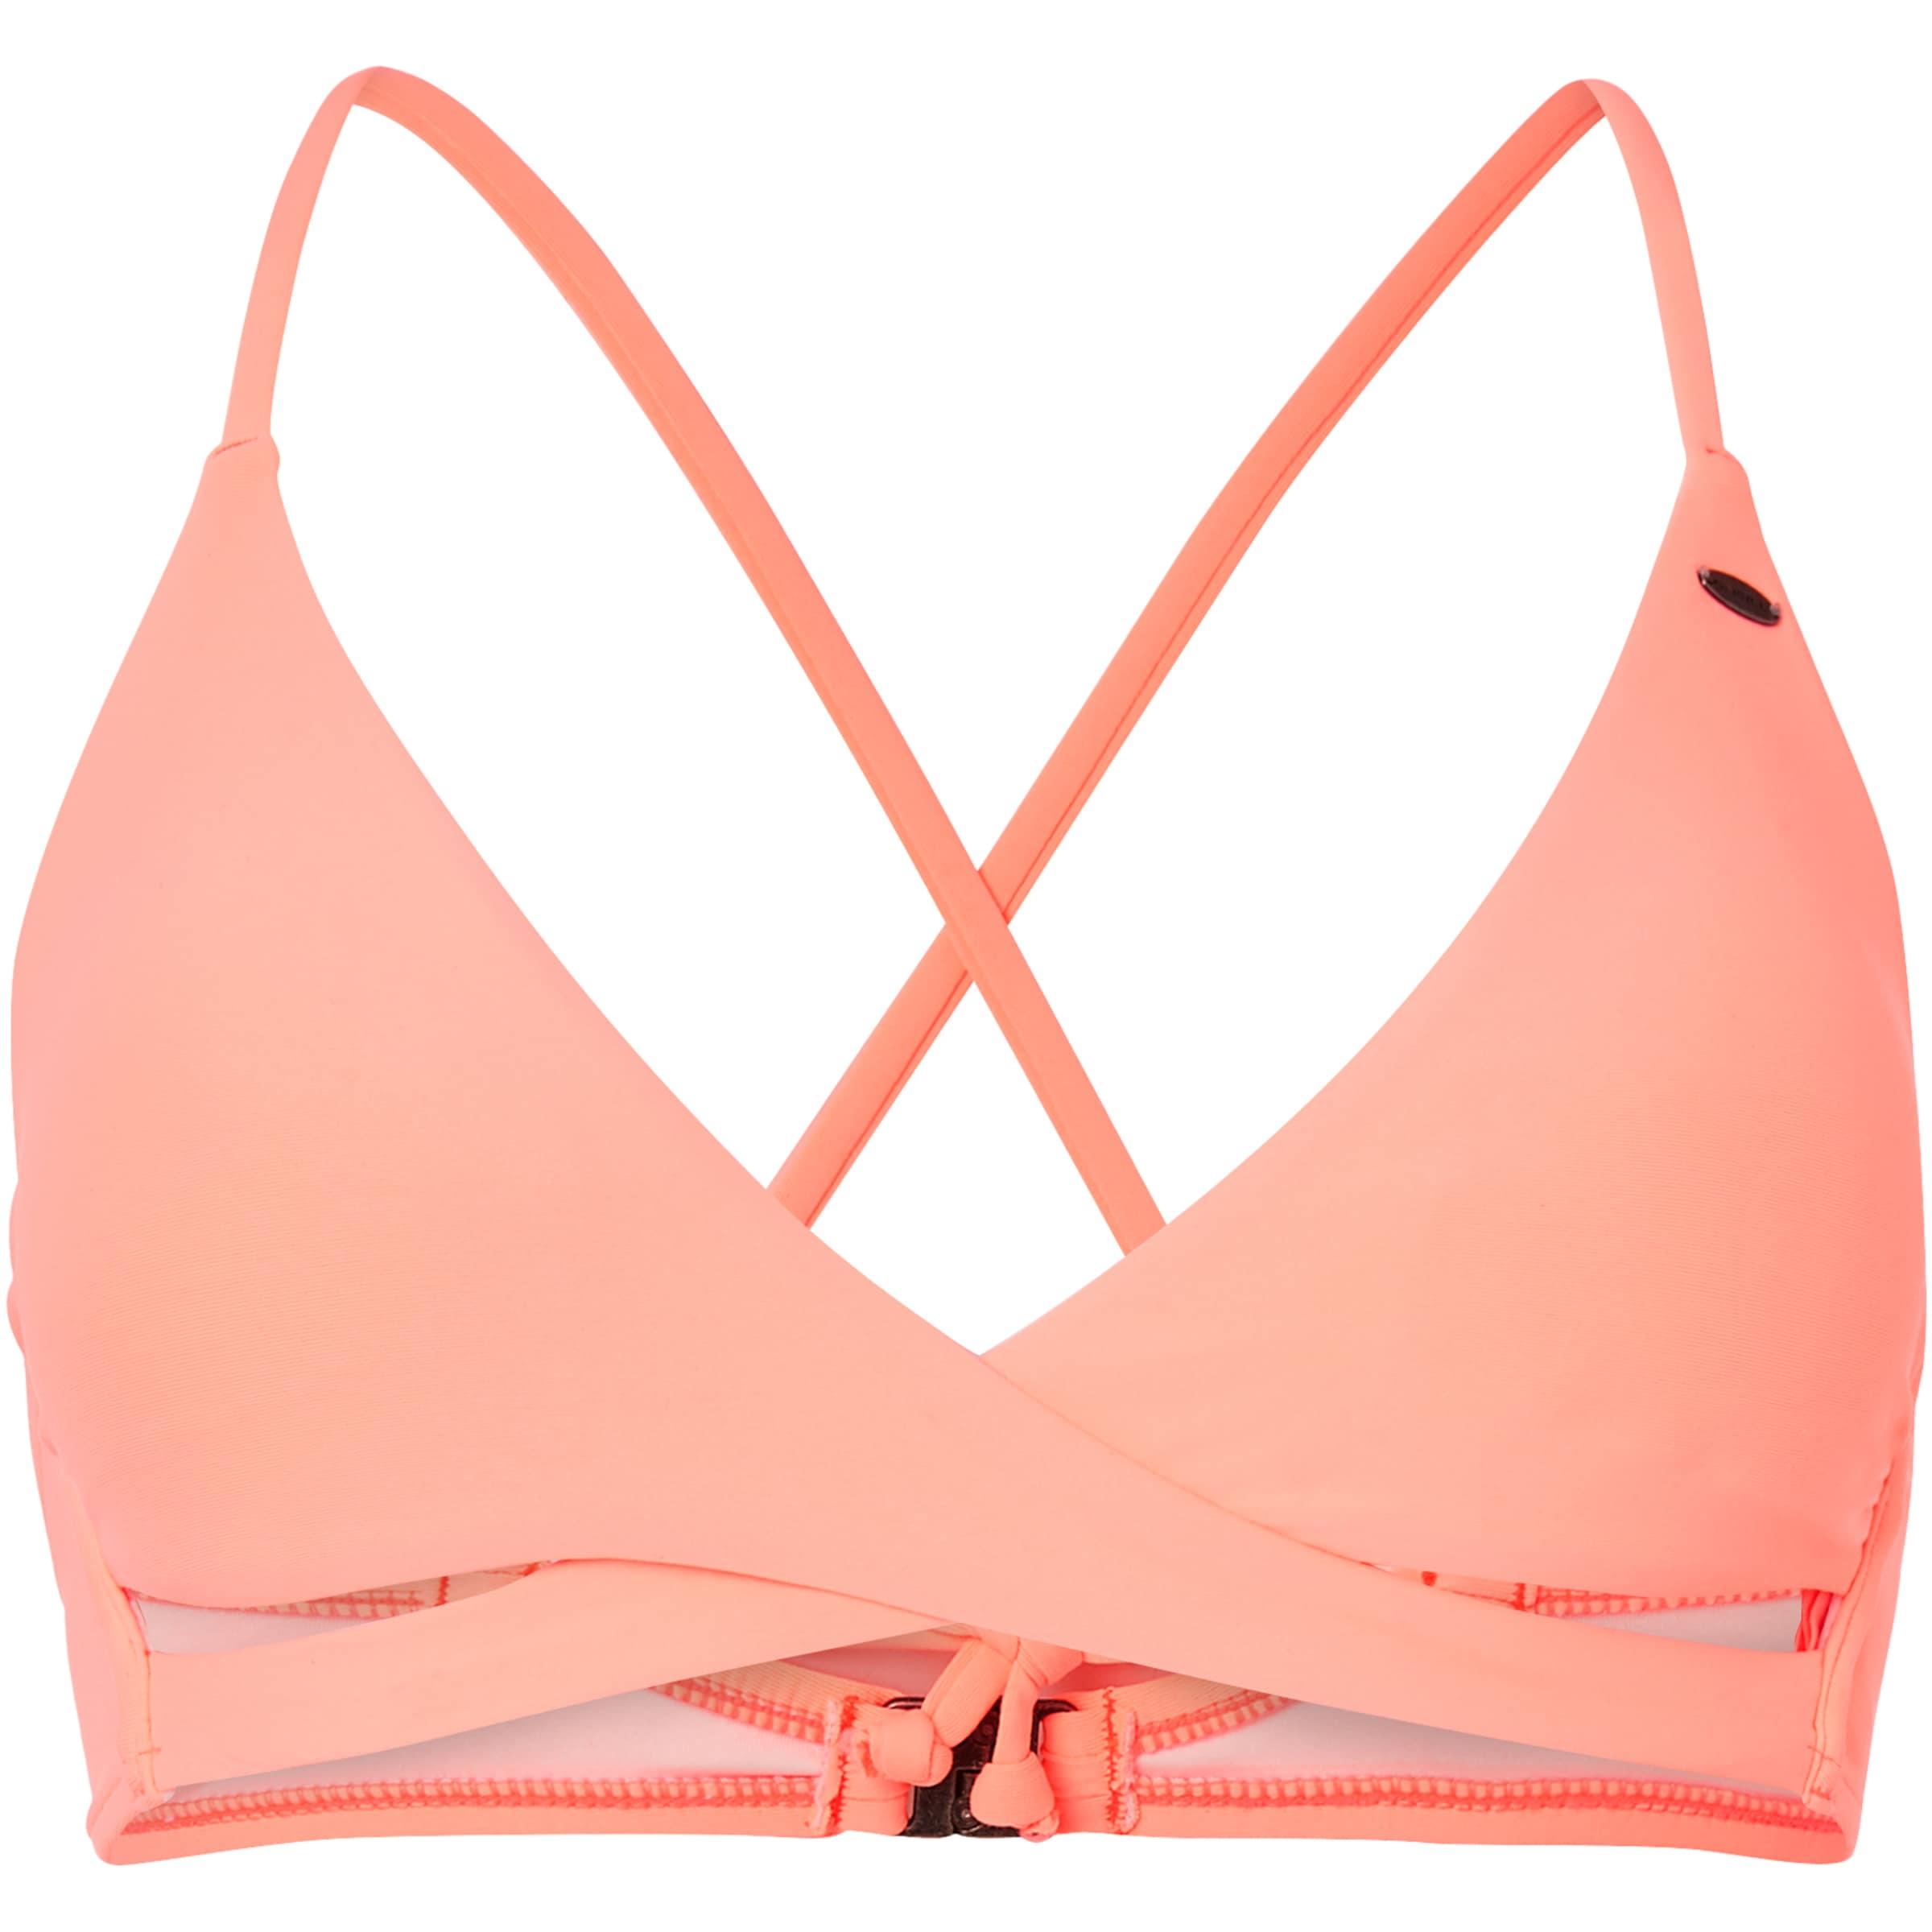 En Pêche O'neill De Mix' Hauts 'baay Bikini uXPiOkZ